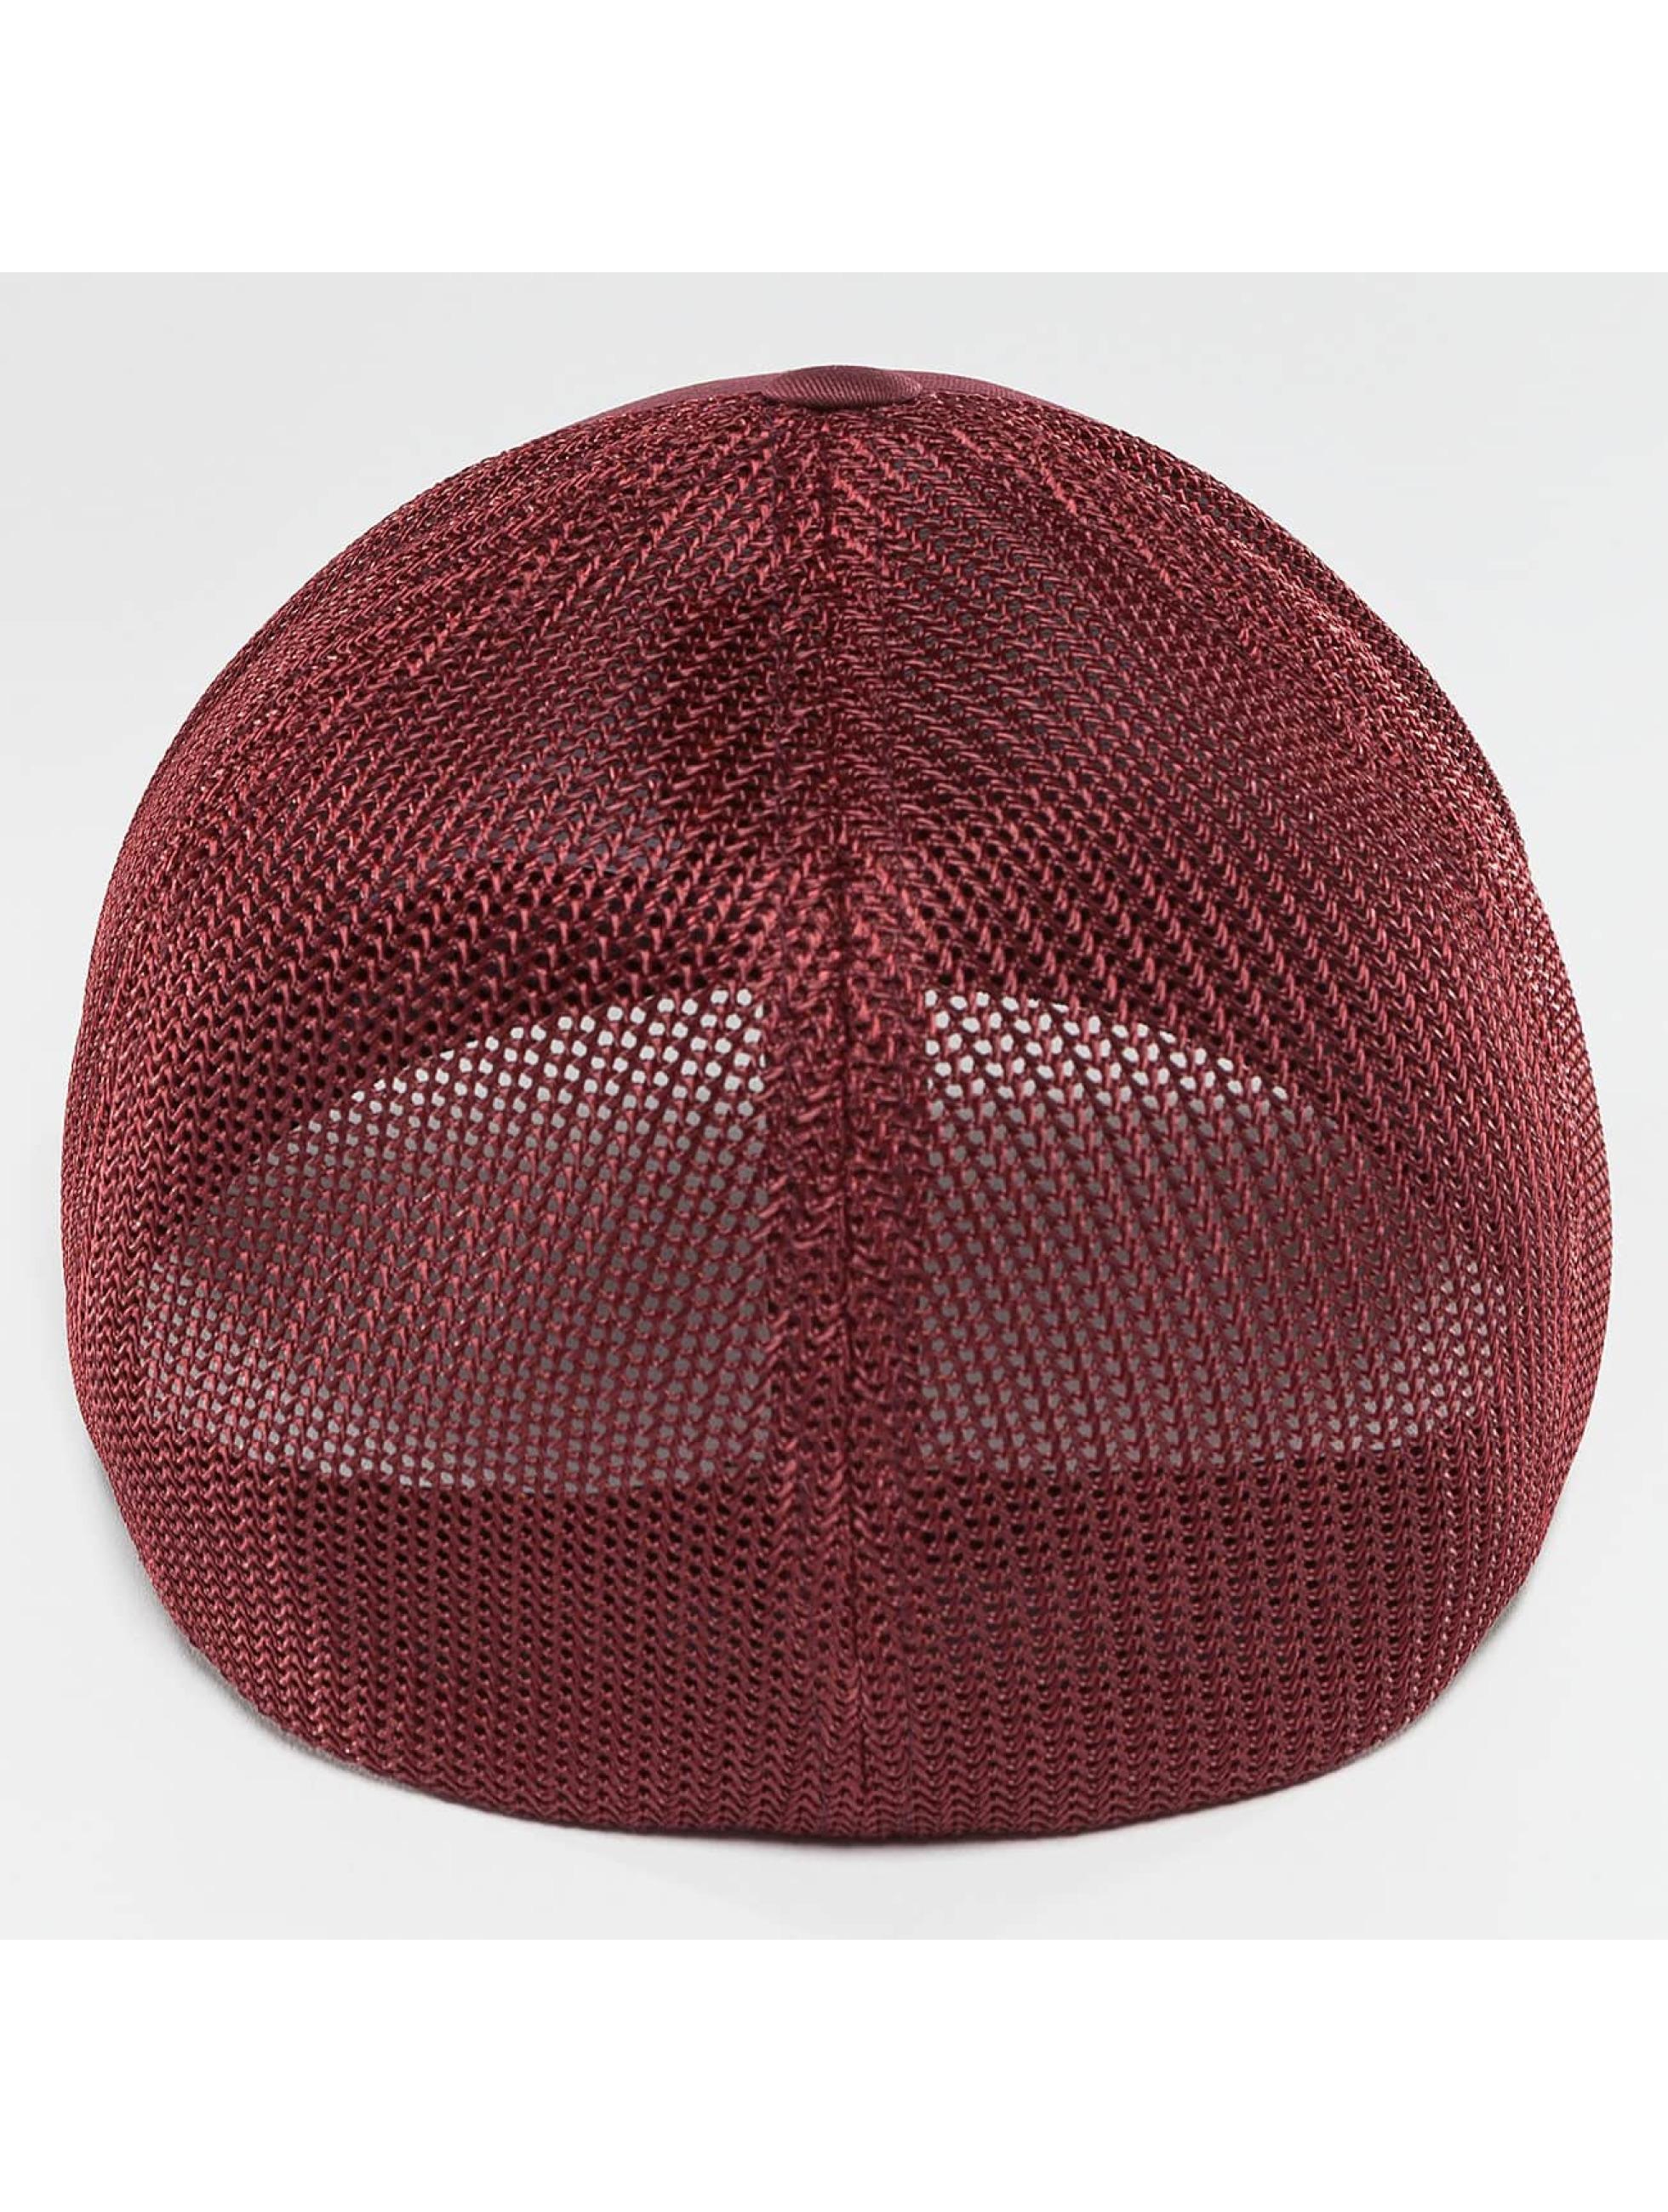 Flexfit Flexfitted Cap Mesh Cotton Twill rood